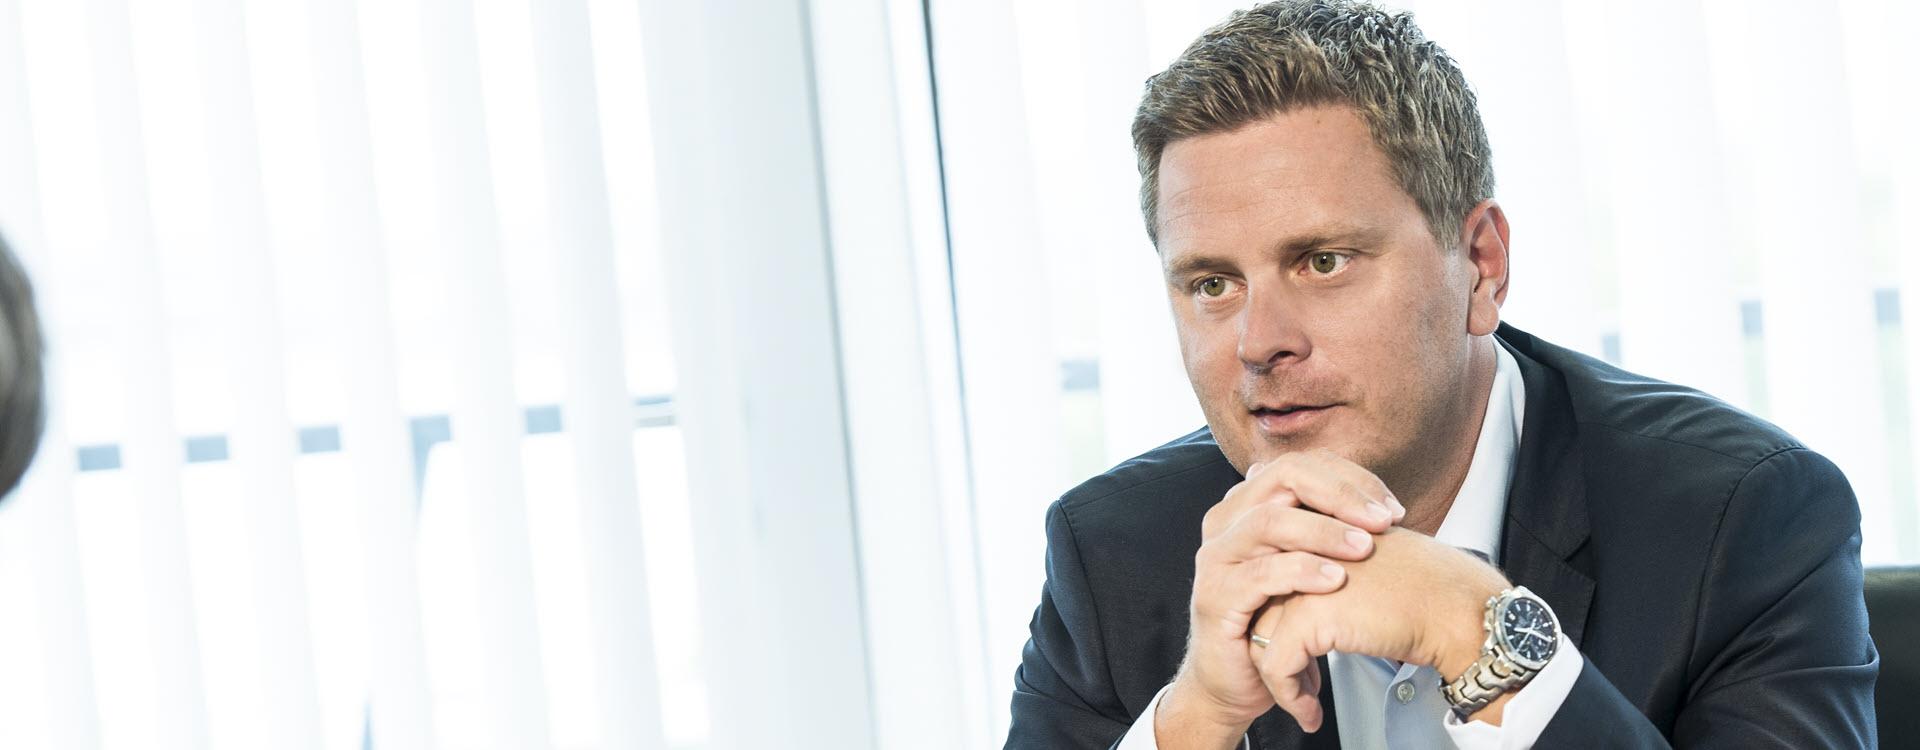 Switzerland: Thomas Schinecker named chief executive of